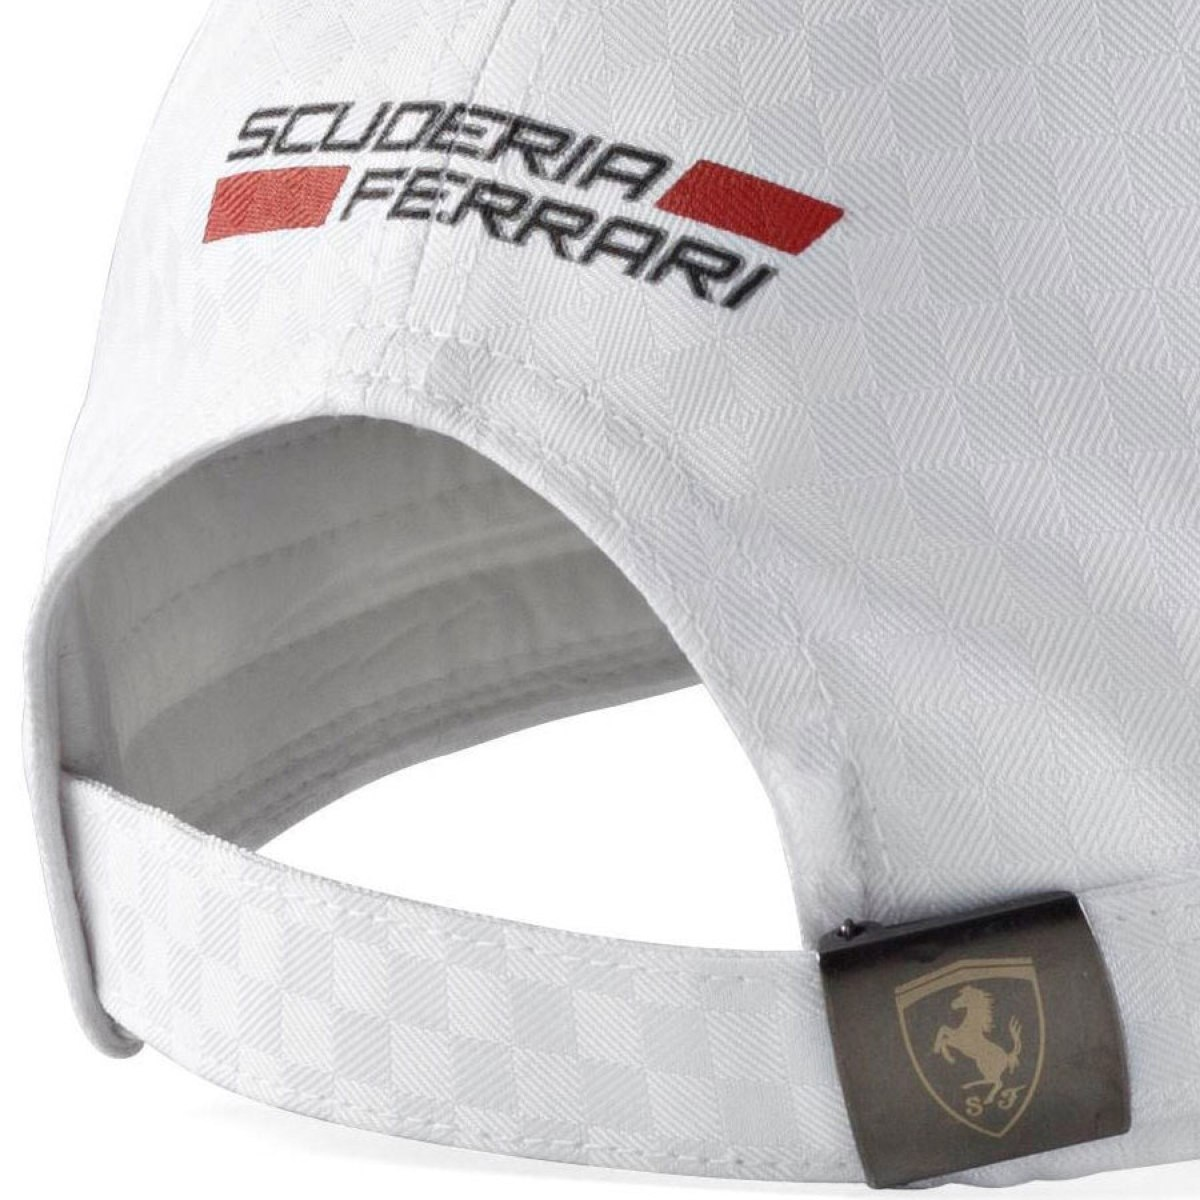 gorra scuderia ferrari oficial f1 carbono roja blanca negra. Cargando zoom. 805d2d321b4